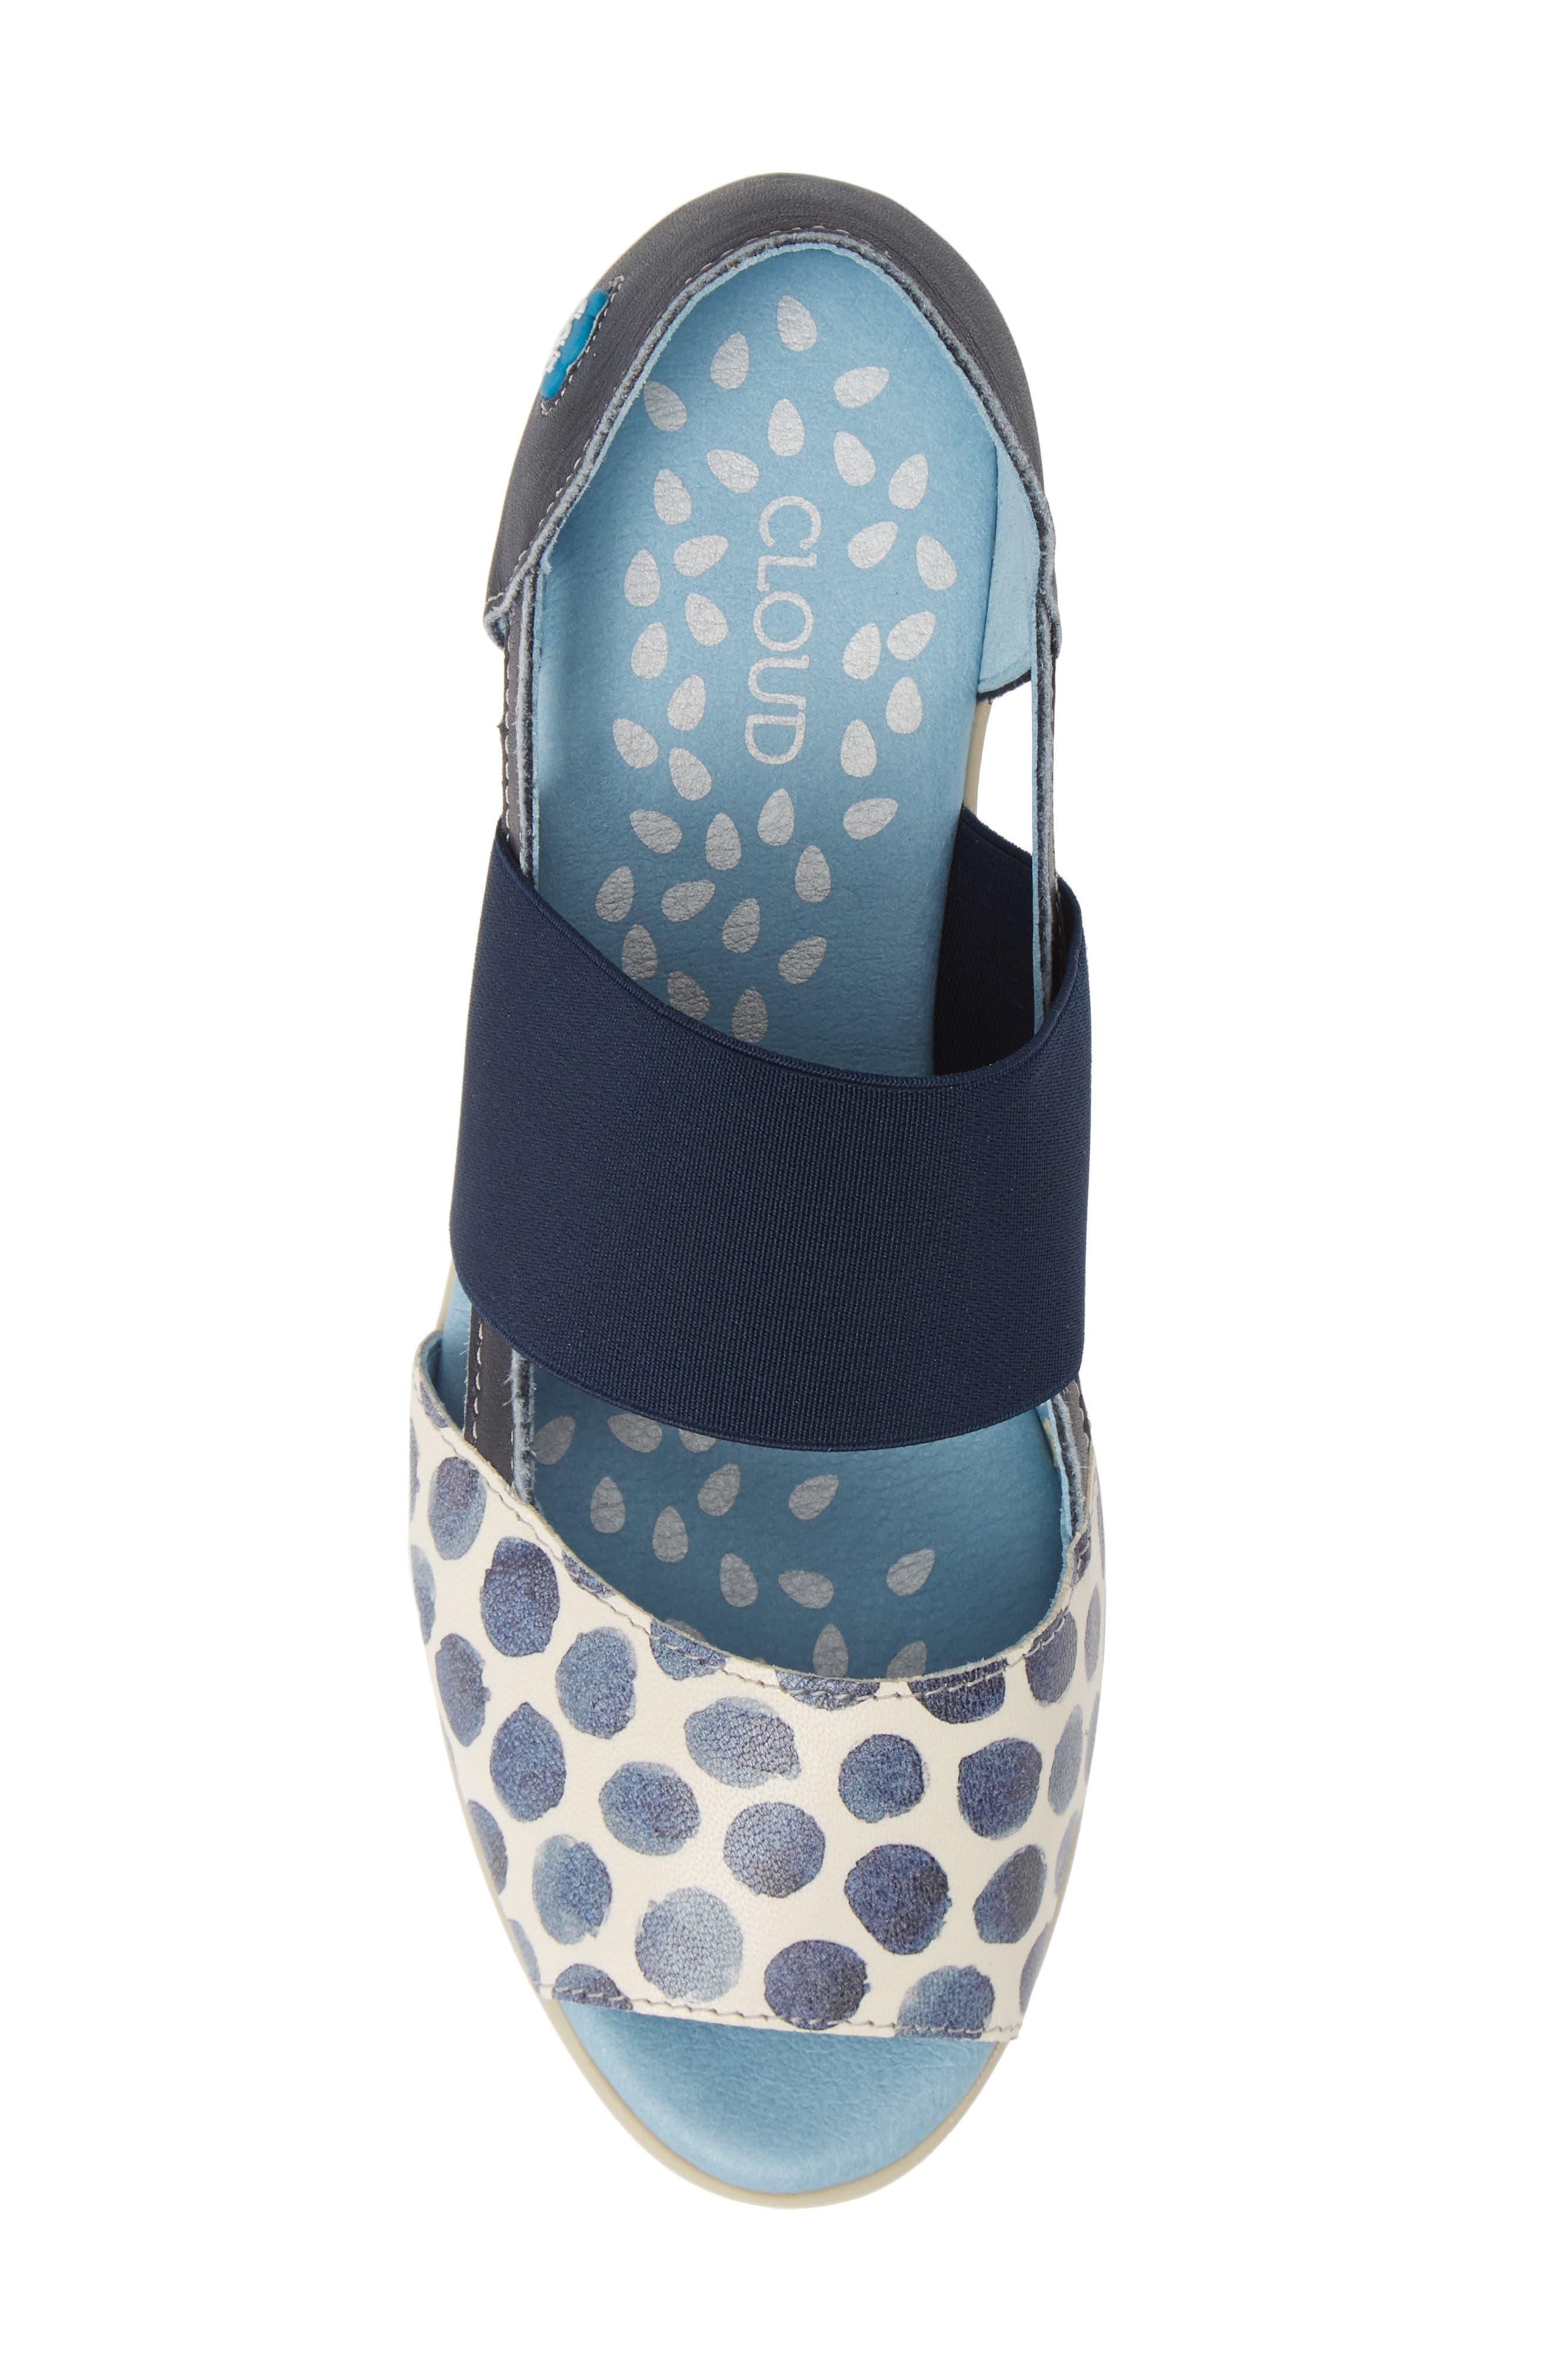 CLOUD,                             'Canary' Skimmer Sandal,                             Alternate thumbnail 5, color,                             TUPAI BLUE LEATHER